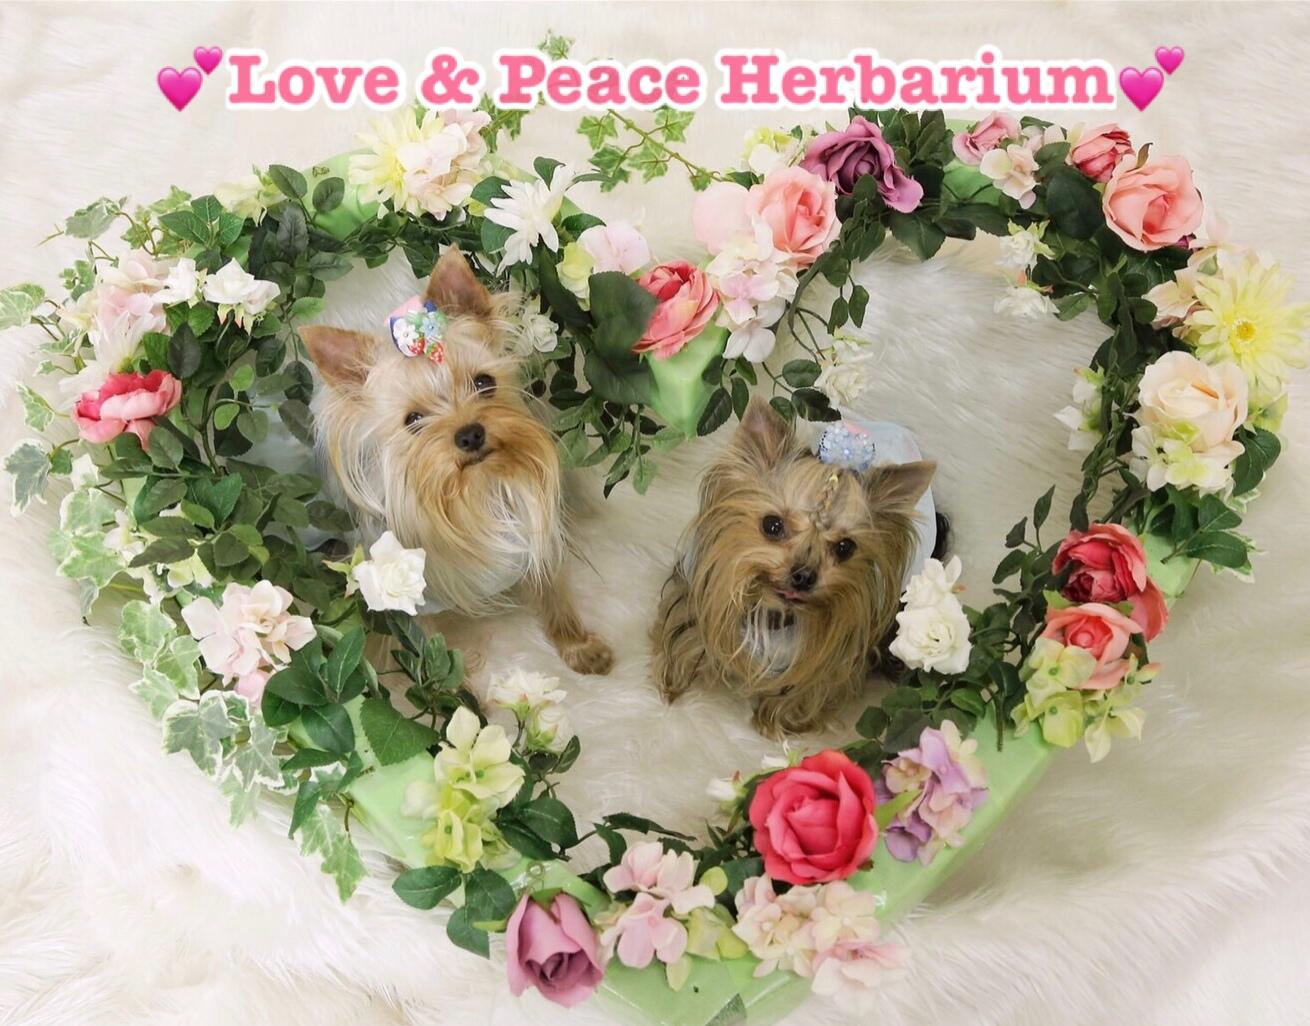 love.and.peace.herbarium〜らぶ&ぴいすハーバリウム〜